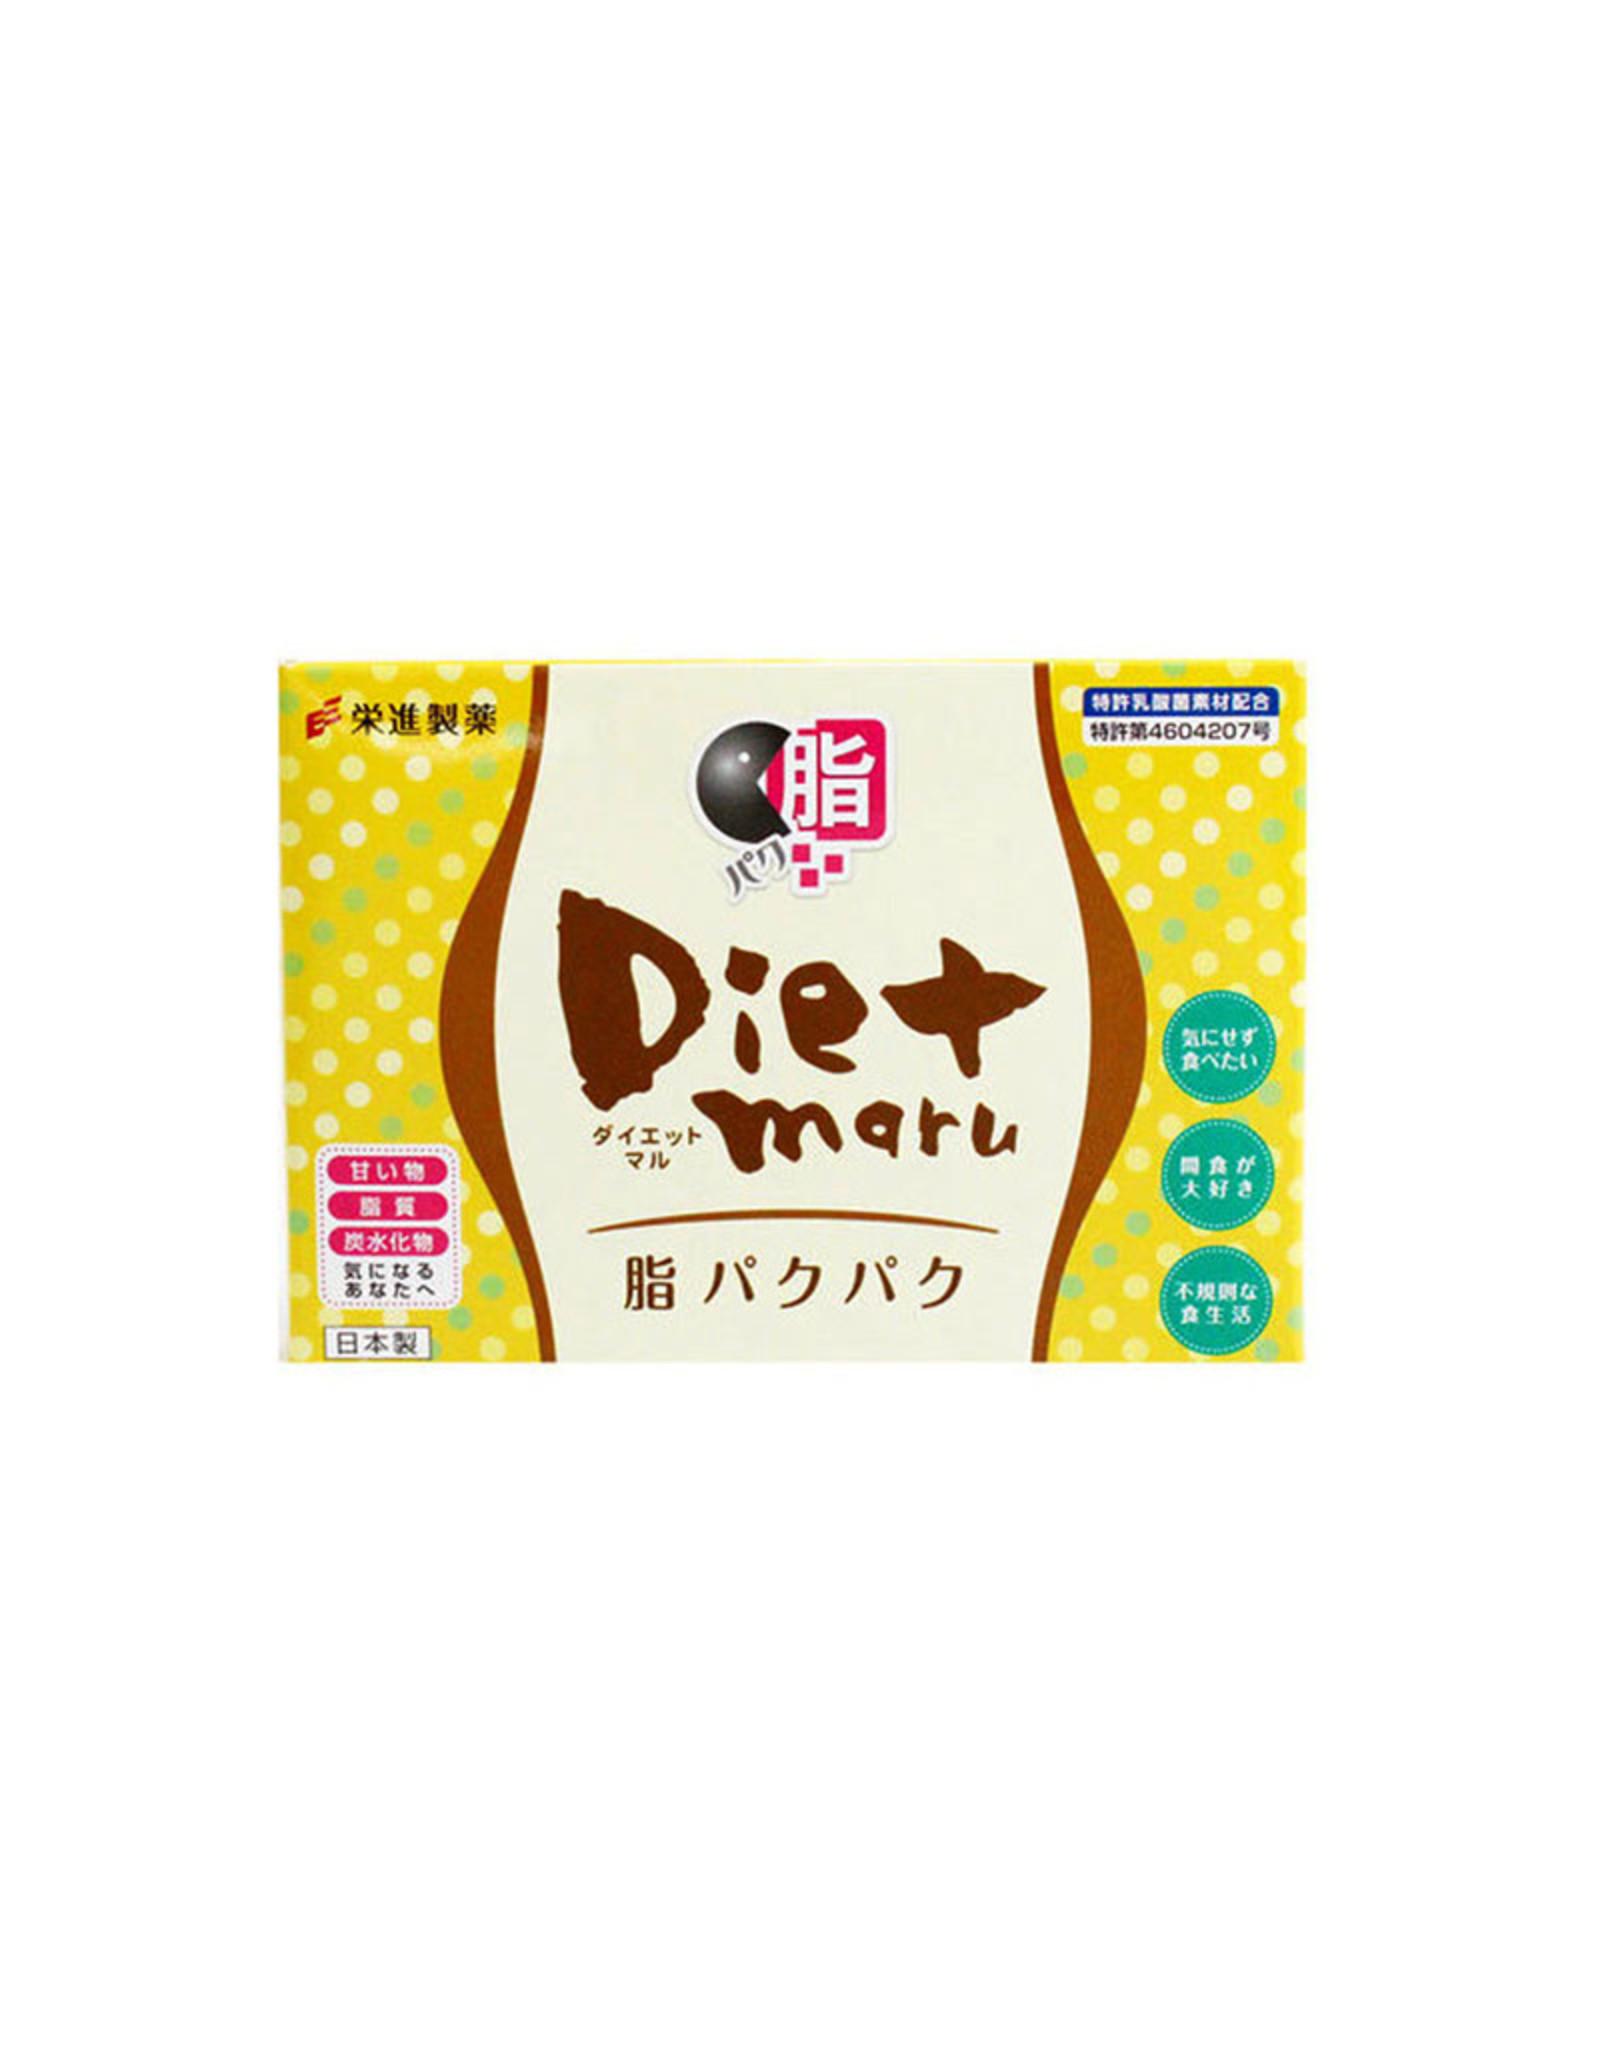 Eishin Pharmaceutical Diet Maru Jelly 12g x 10